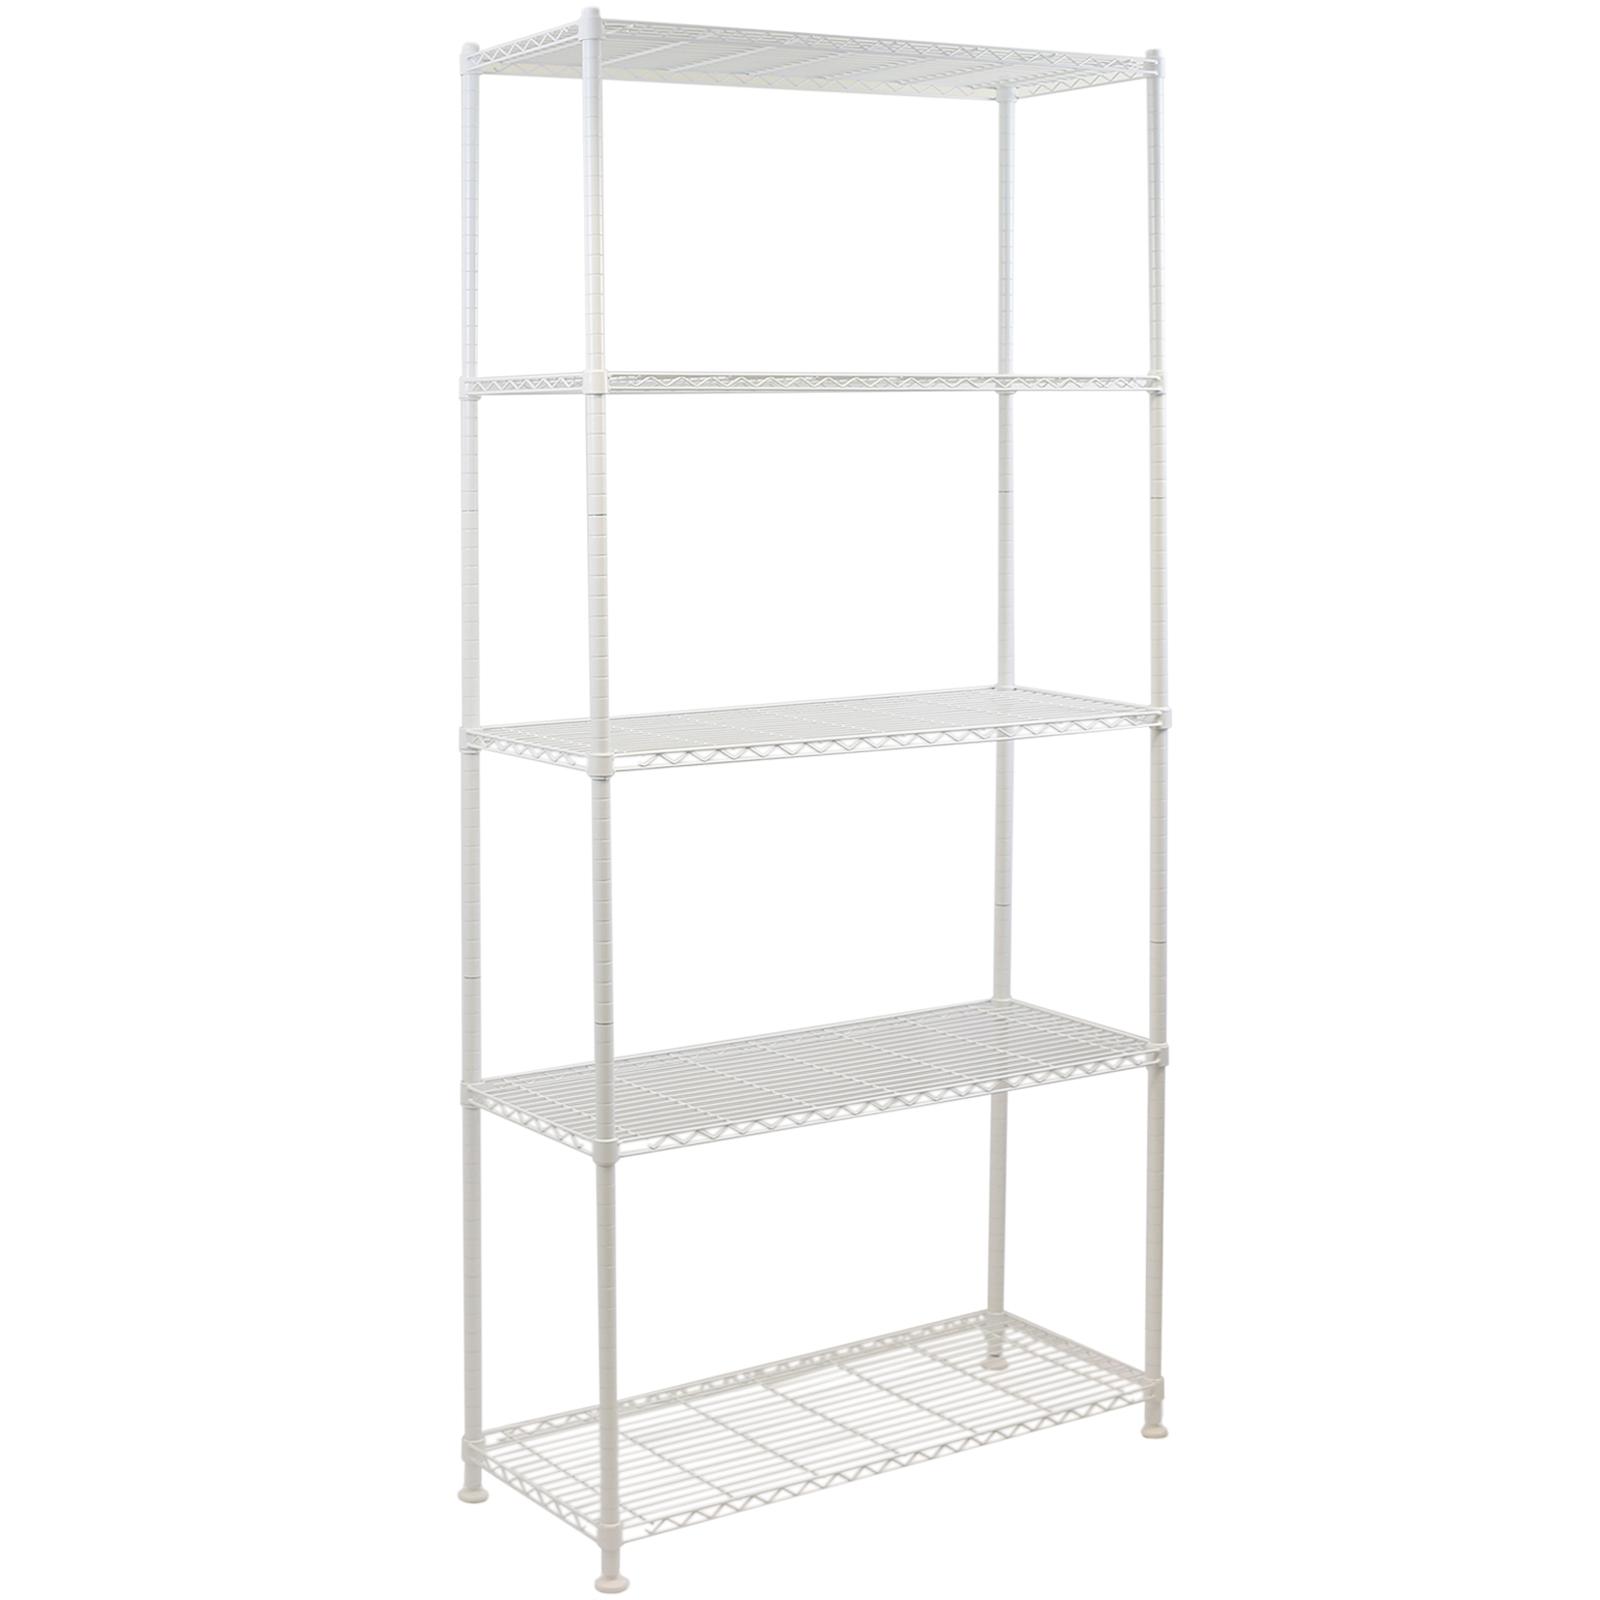 5 Tier Metal Storage Rack Shelving Book Shelf Kitchen